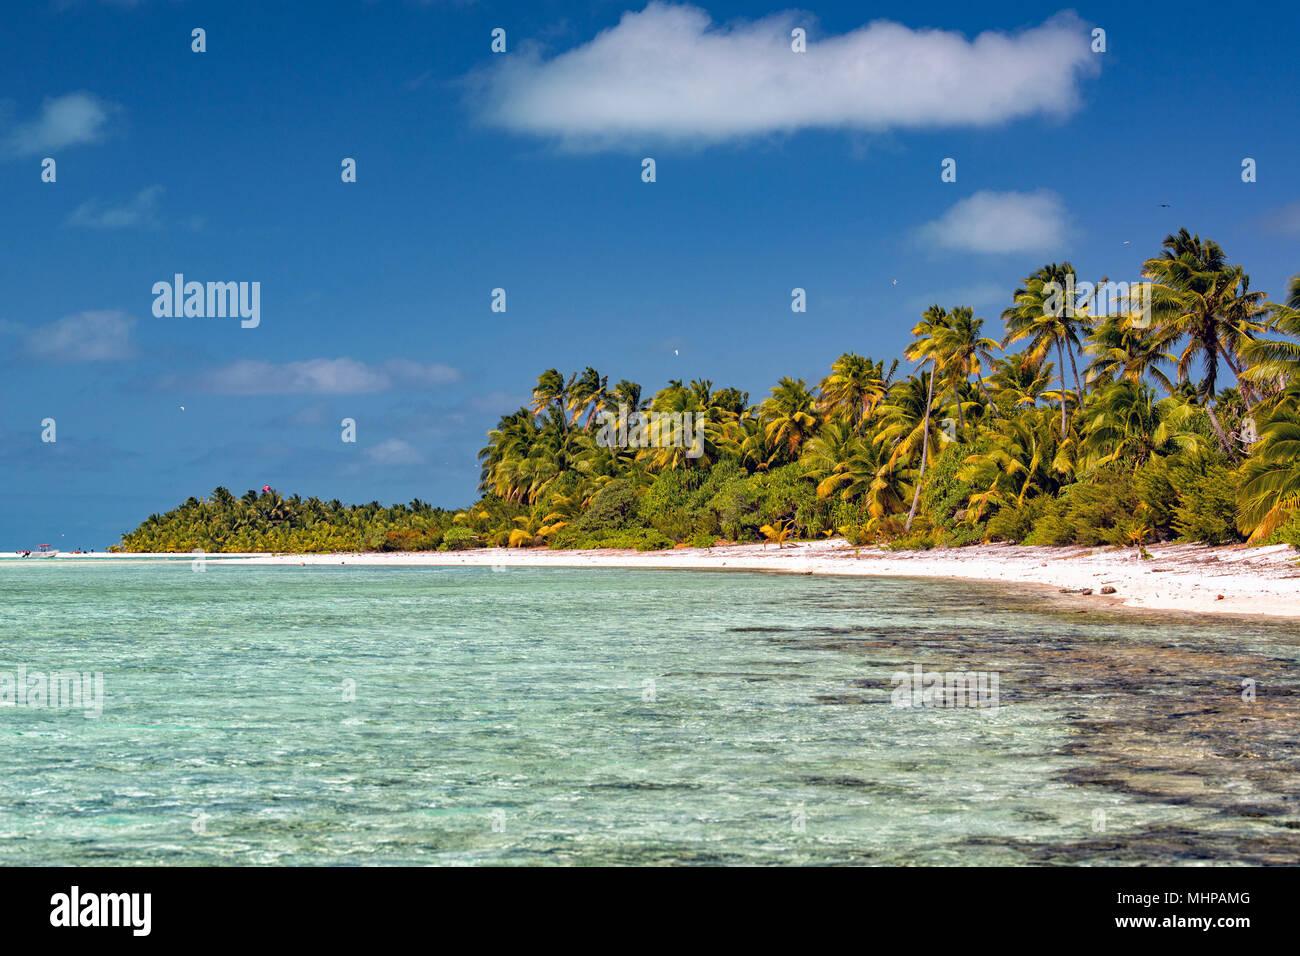 Aitutaki Island Coconut Tree auf Polynesien Strand wunderbare Lagune in Cook Inseln Stockbild